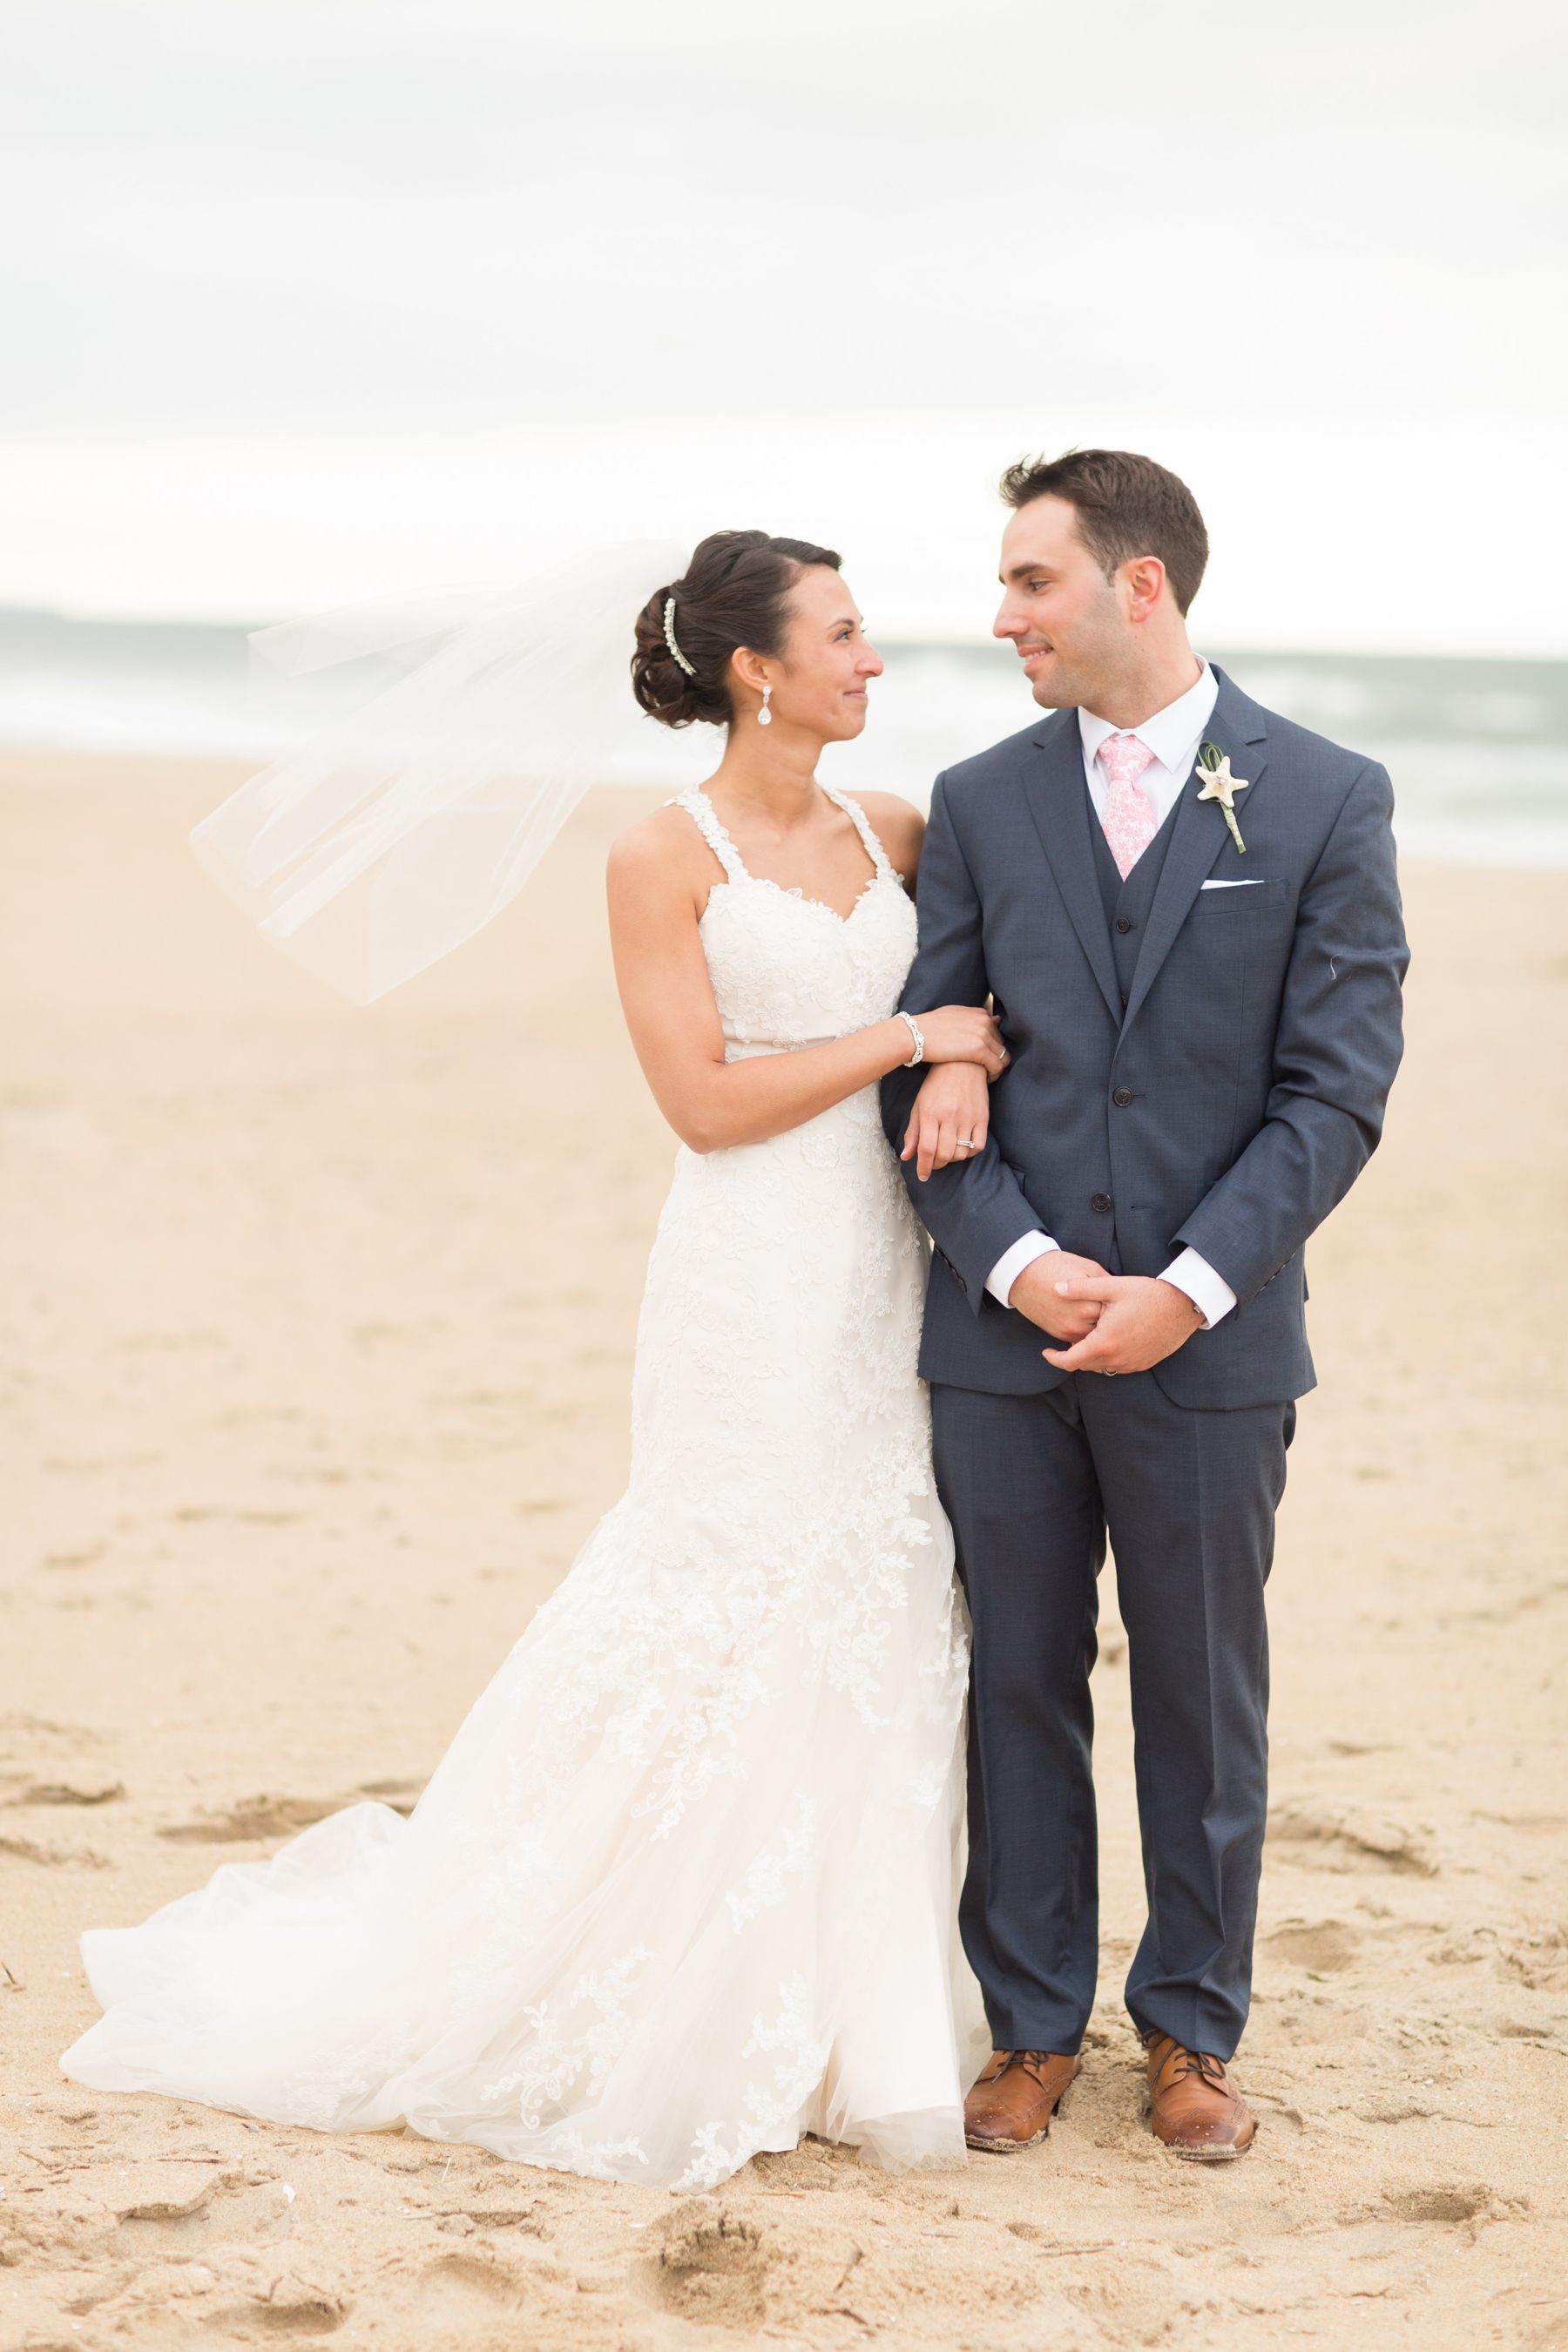 Shifting Sands Wedding in Virginia Beach Wedding sand